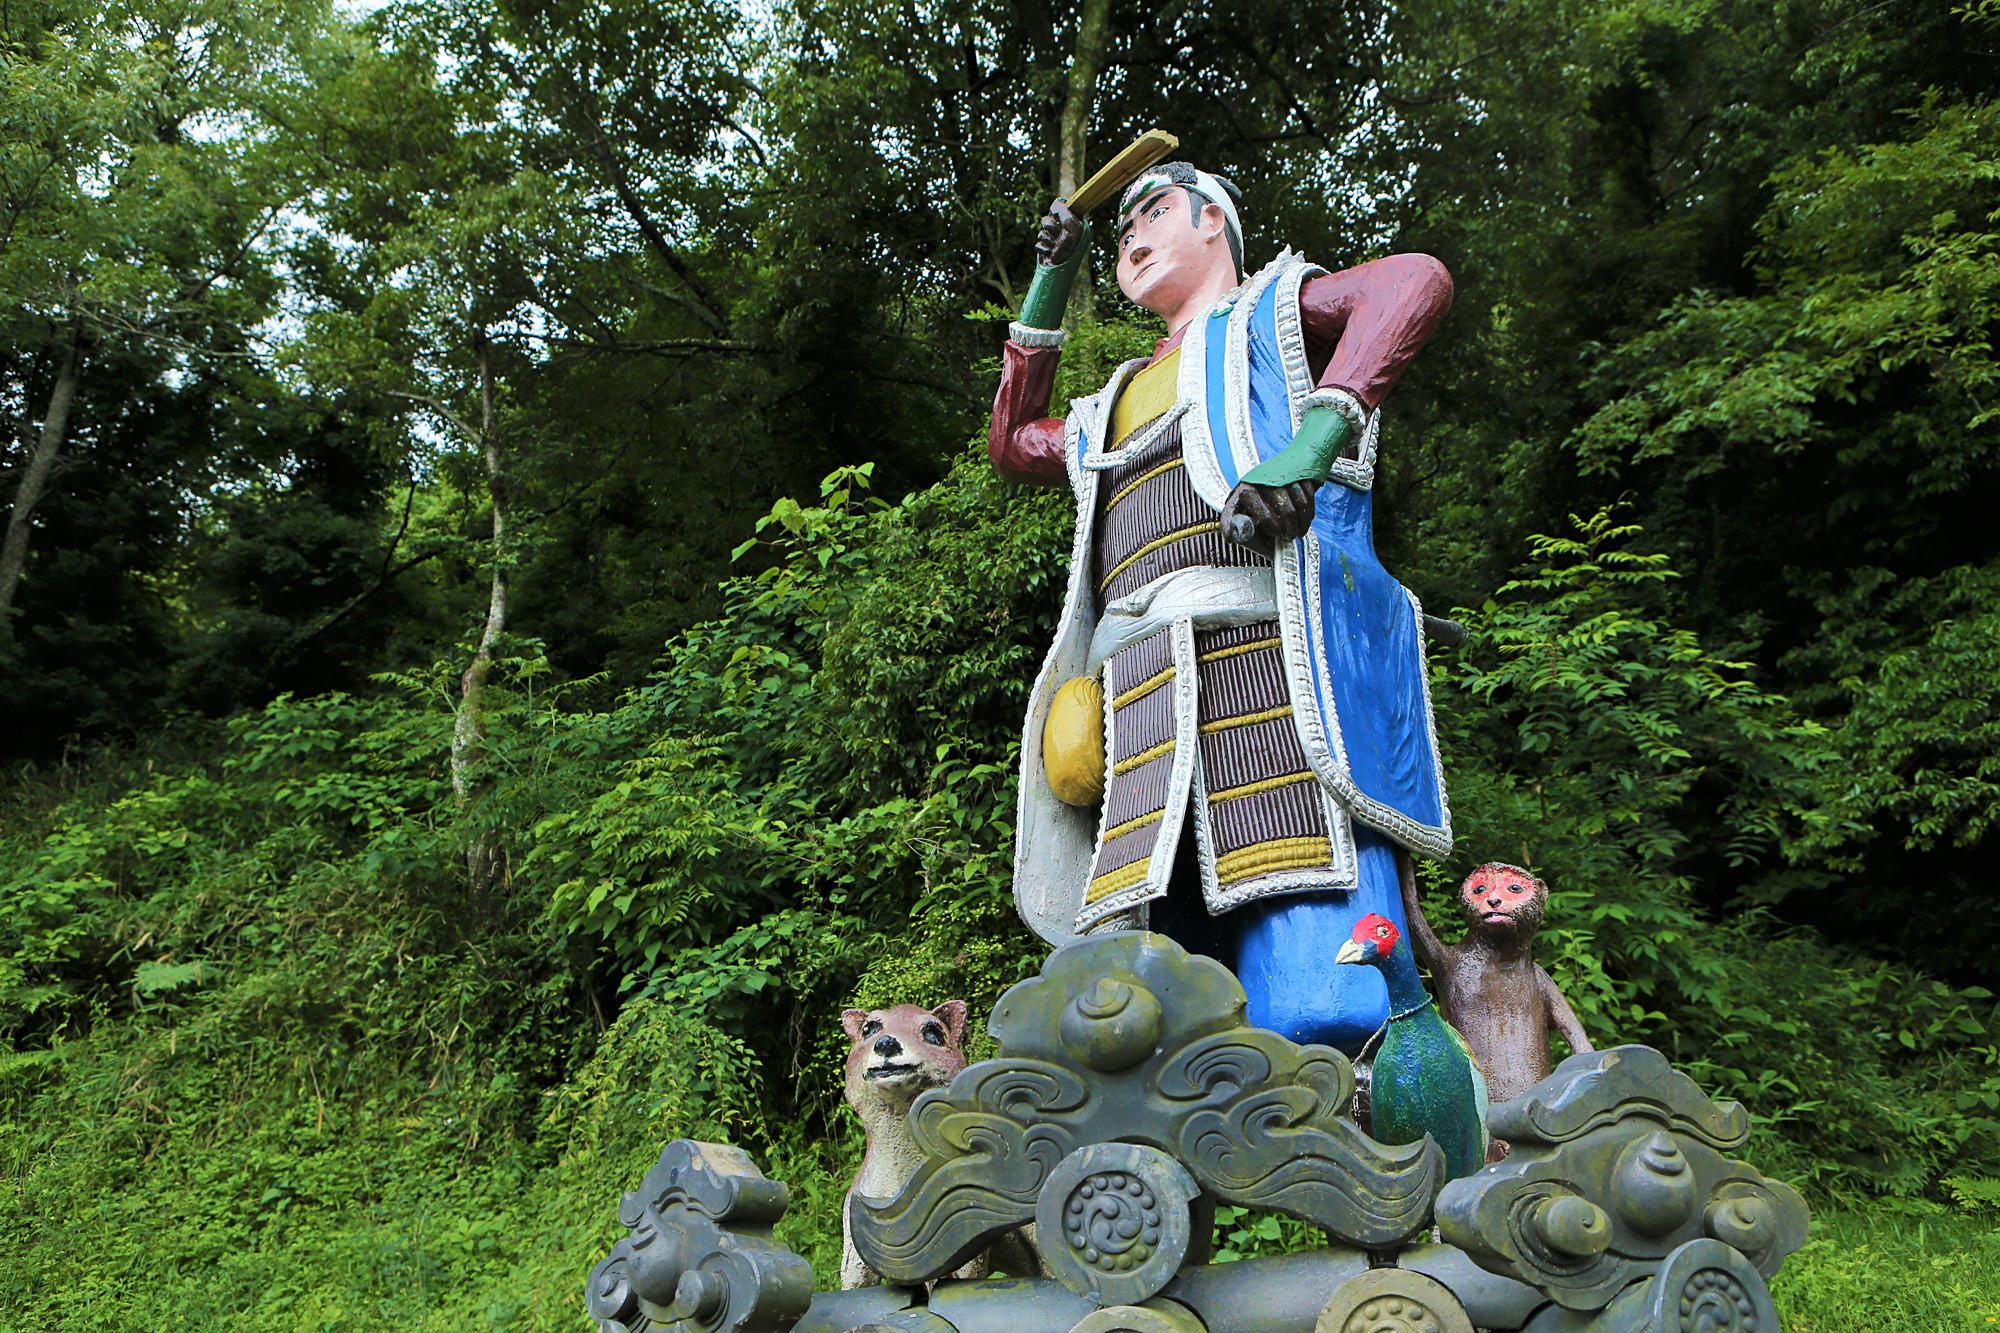 #GiapponeMonogatari – Storie popolari e leggende